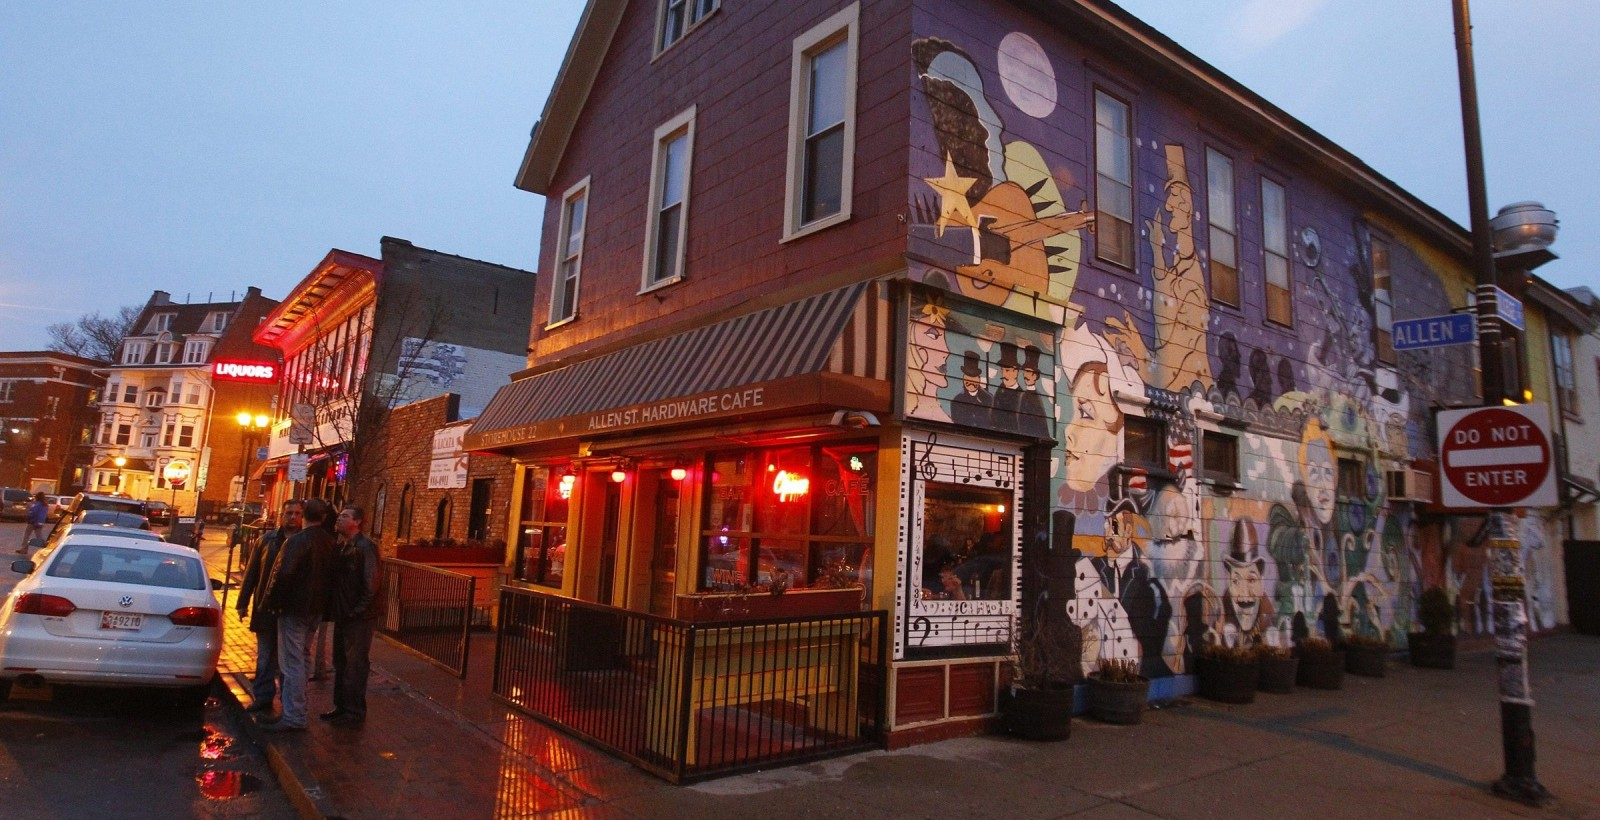 Allen Street Hardware, 245 Allen St. (John Hickey/Buffalo News)